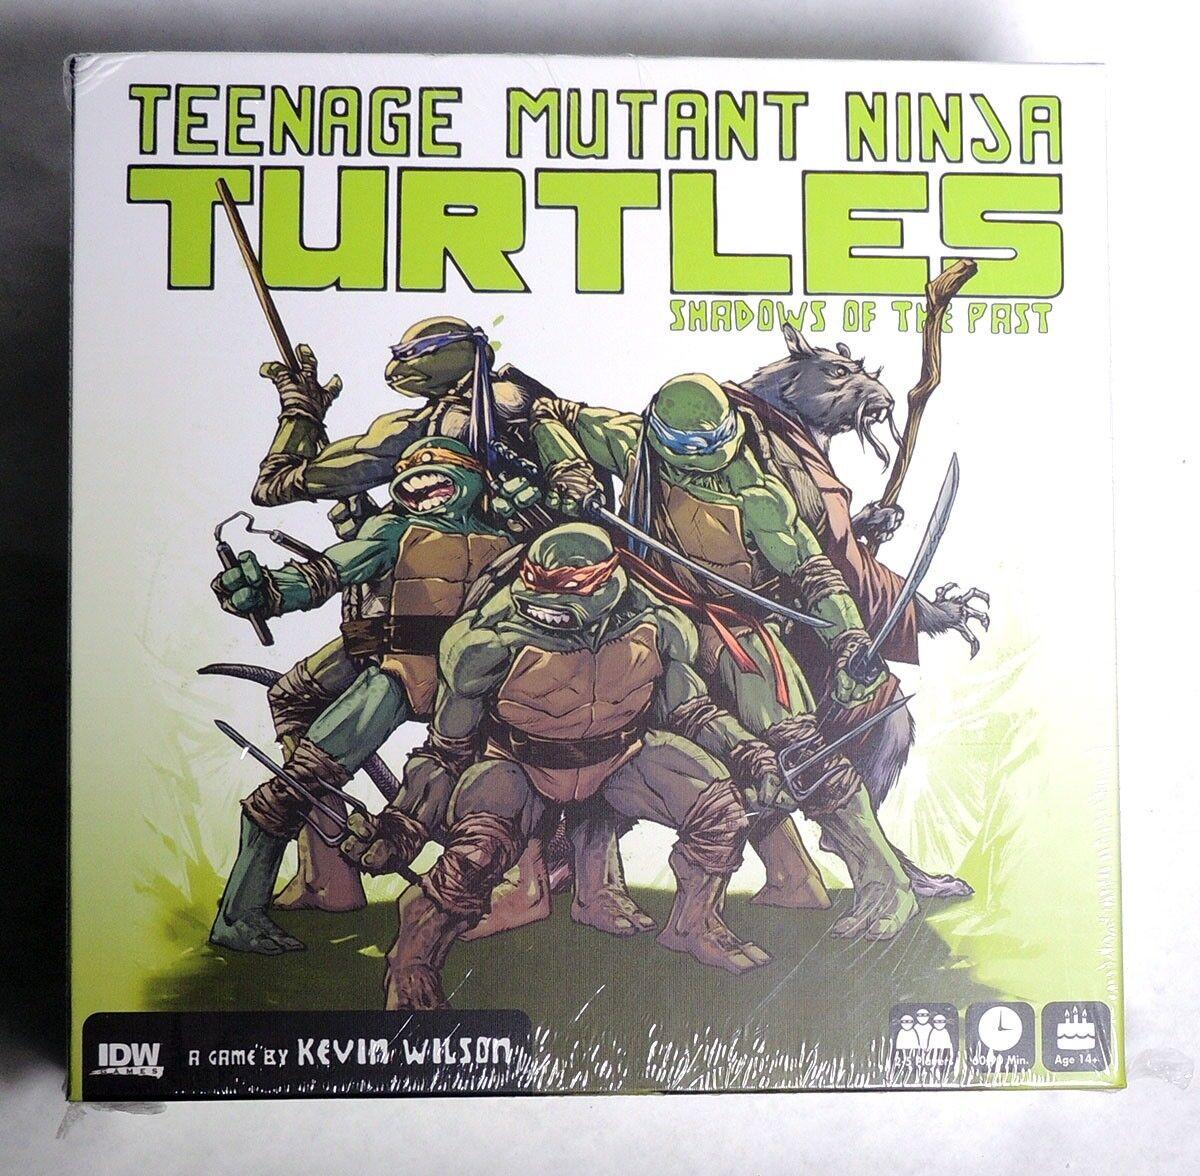 ESZ8883. Teenage Mutant Ninja Turtles SHADOW OF THE PAST Board Game Pandasaurus